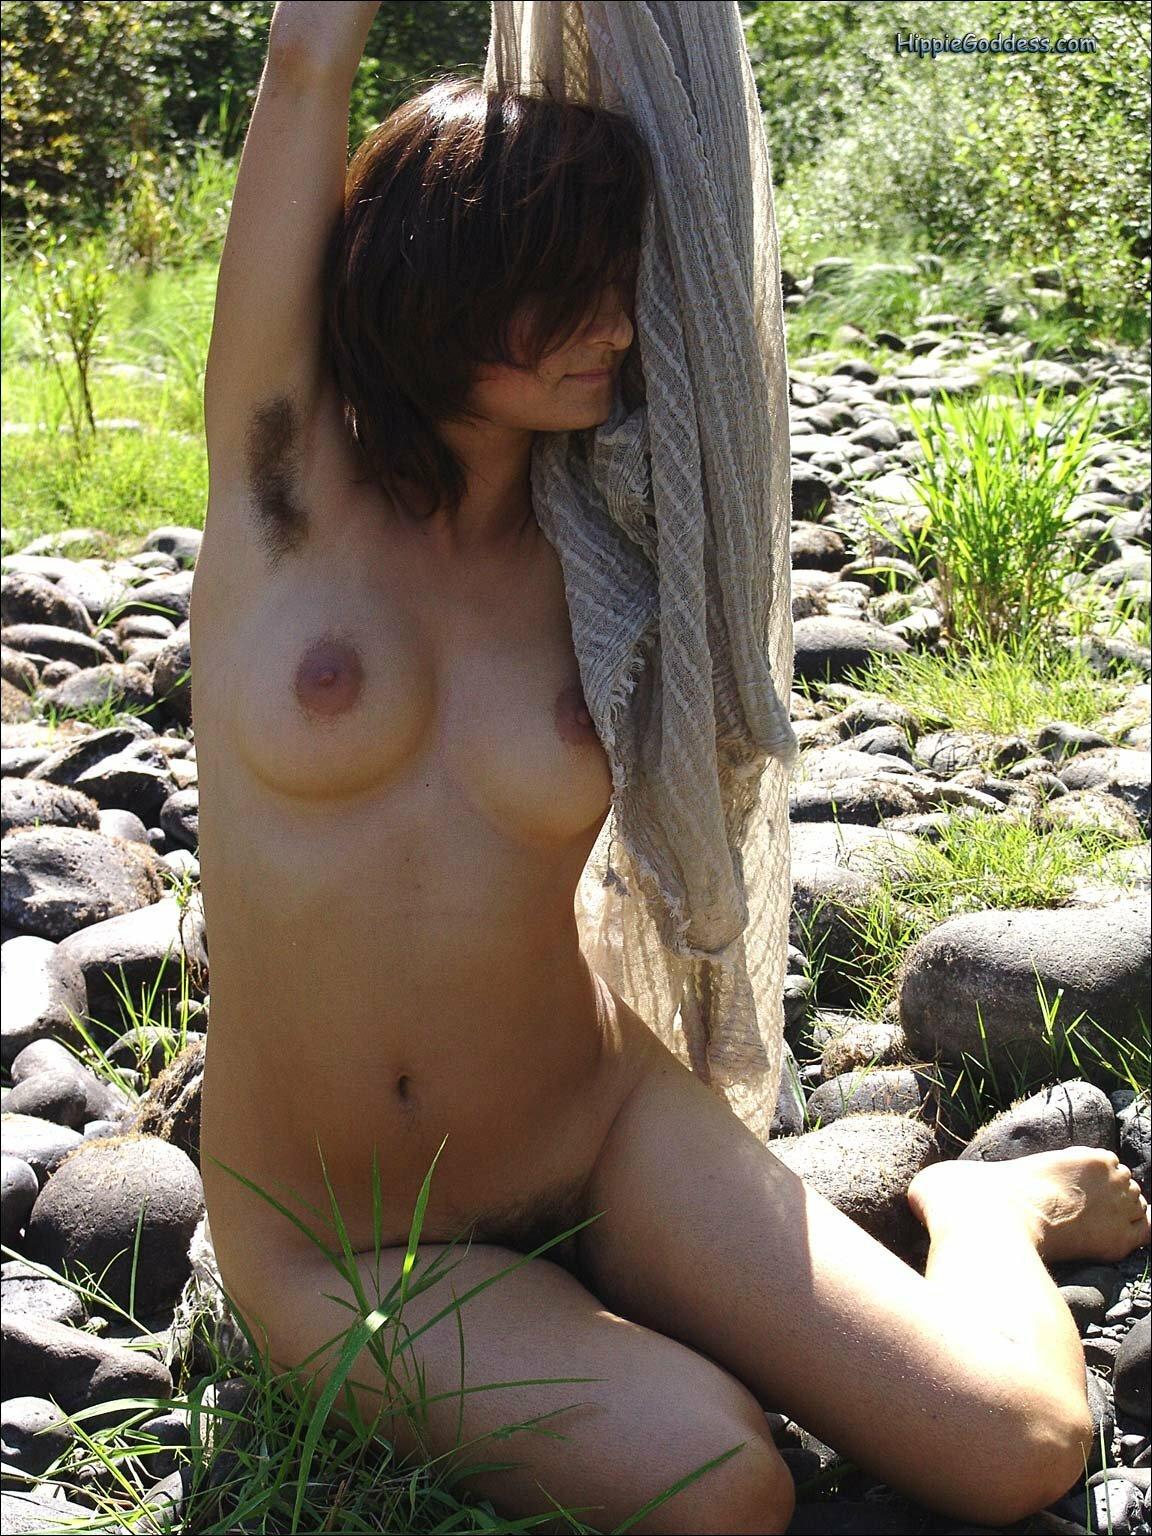 HippieGoddess_-_Brea_01_-_srcbrea1s155.jpg